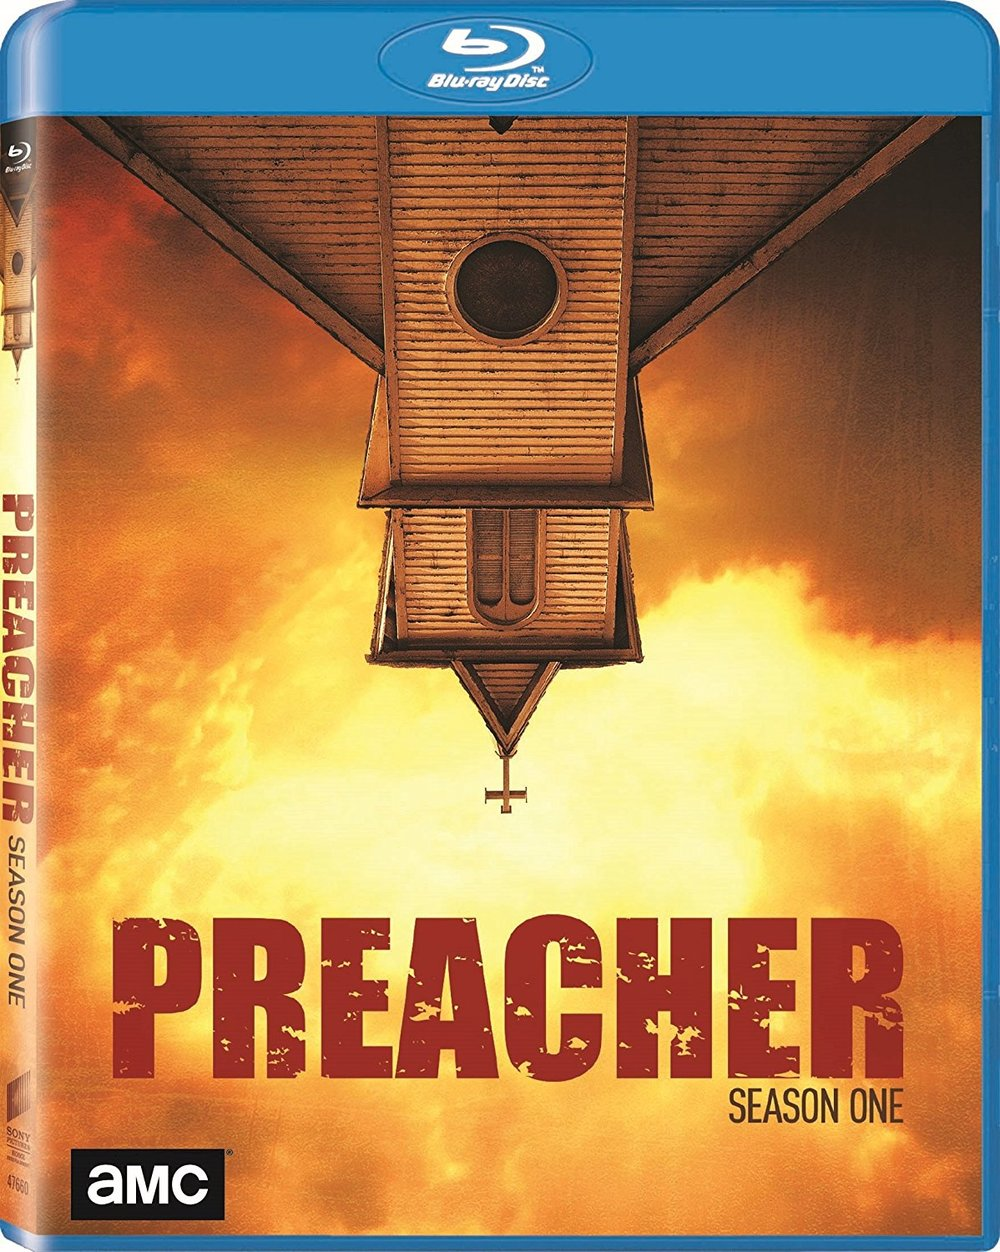 Preacher S1